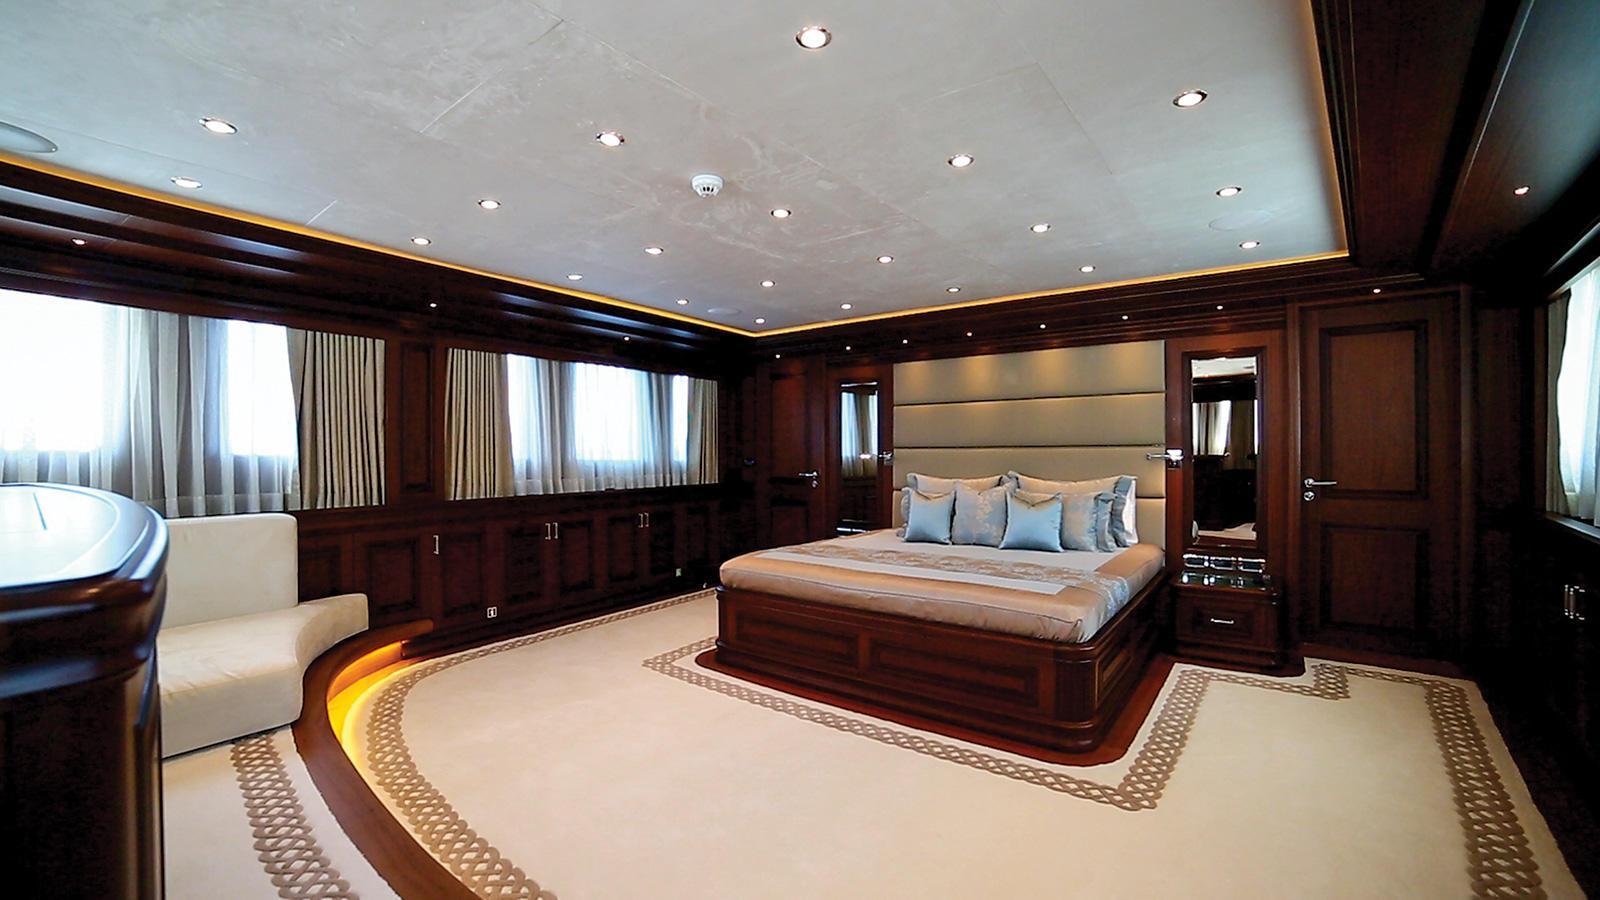 clarity-motor-yacht-bilgin-classic-160-2015-49m-master-stateroom